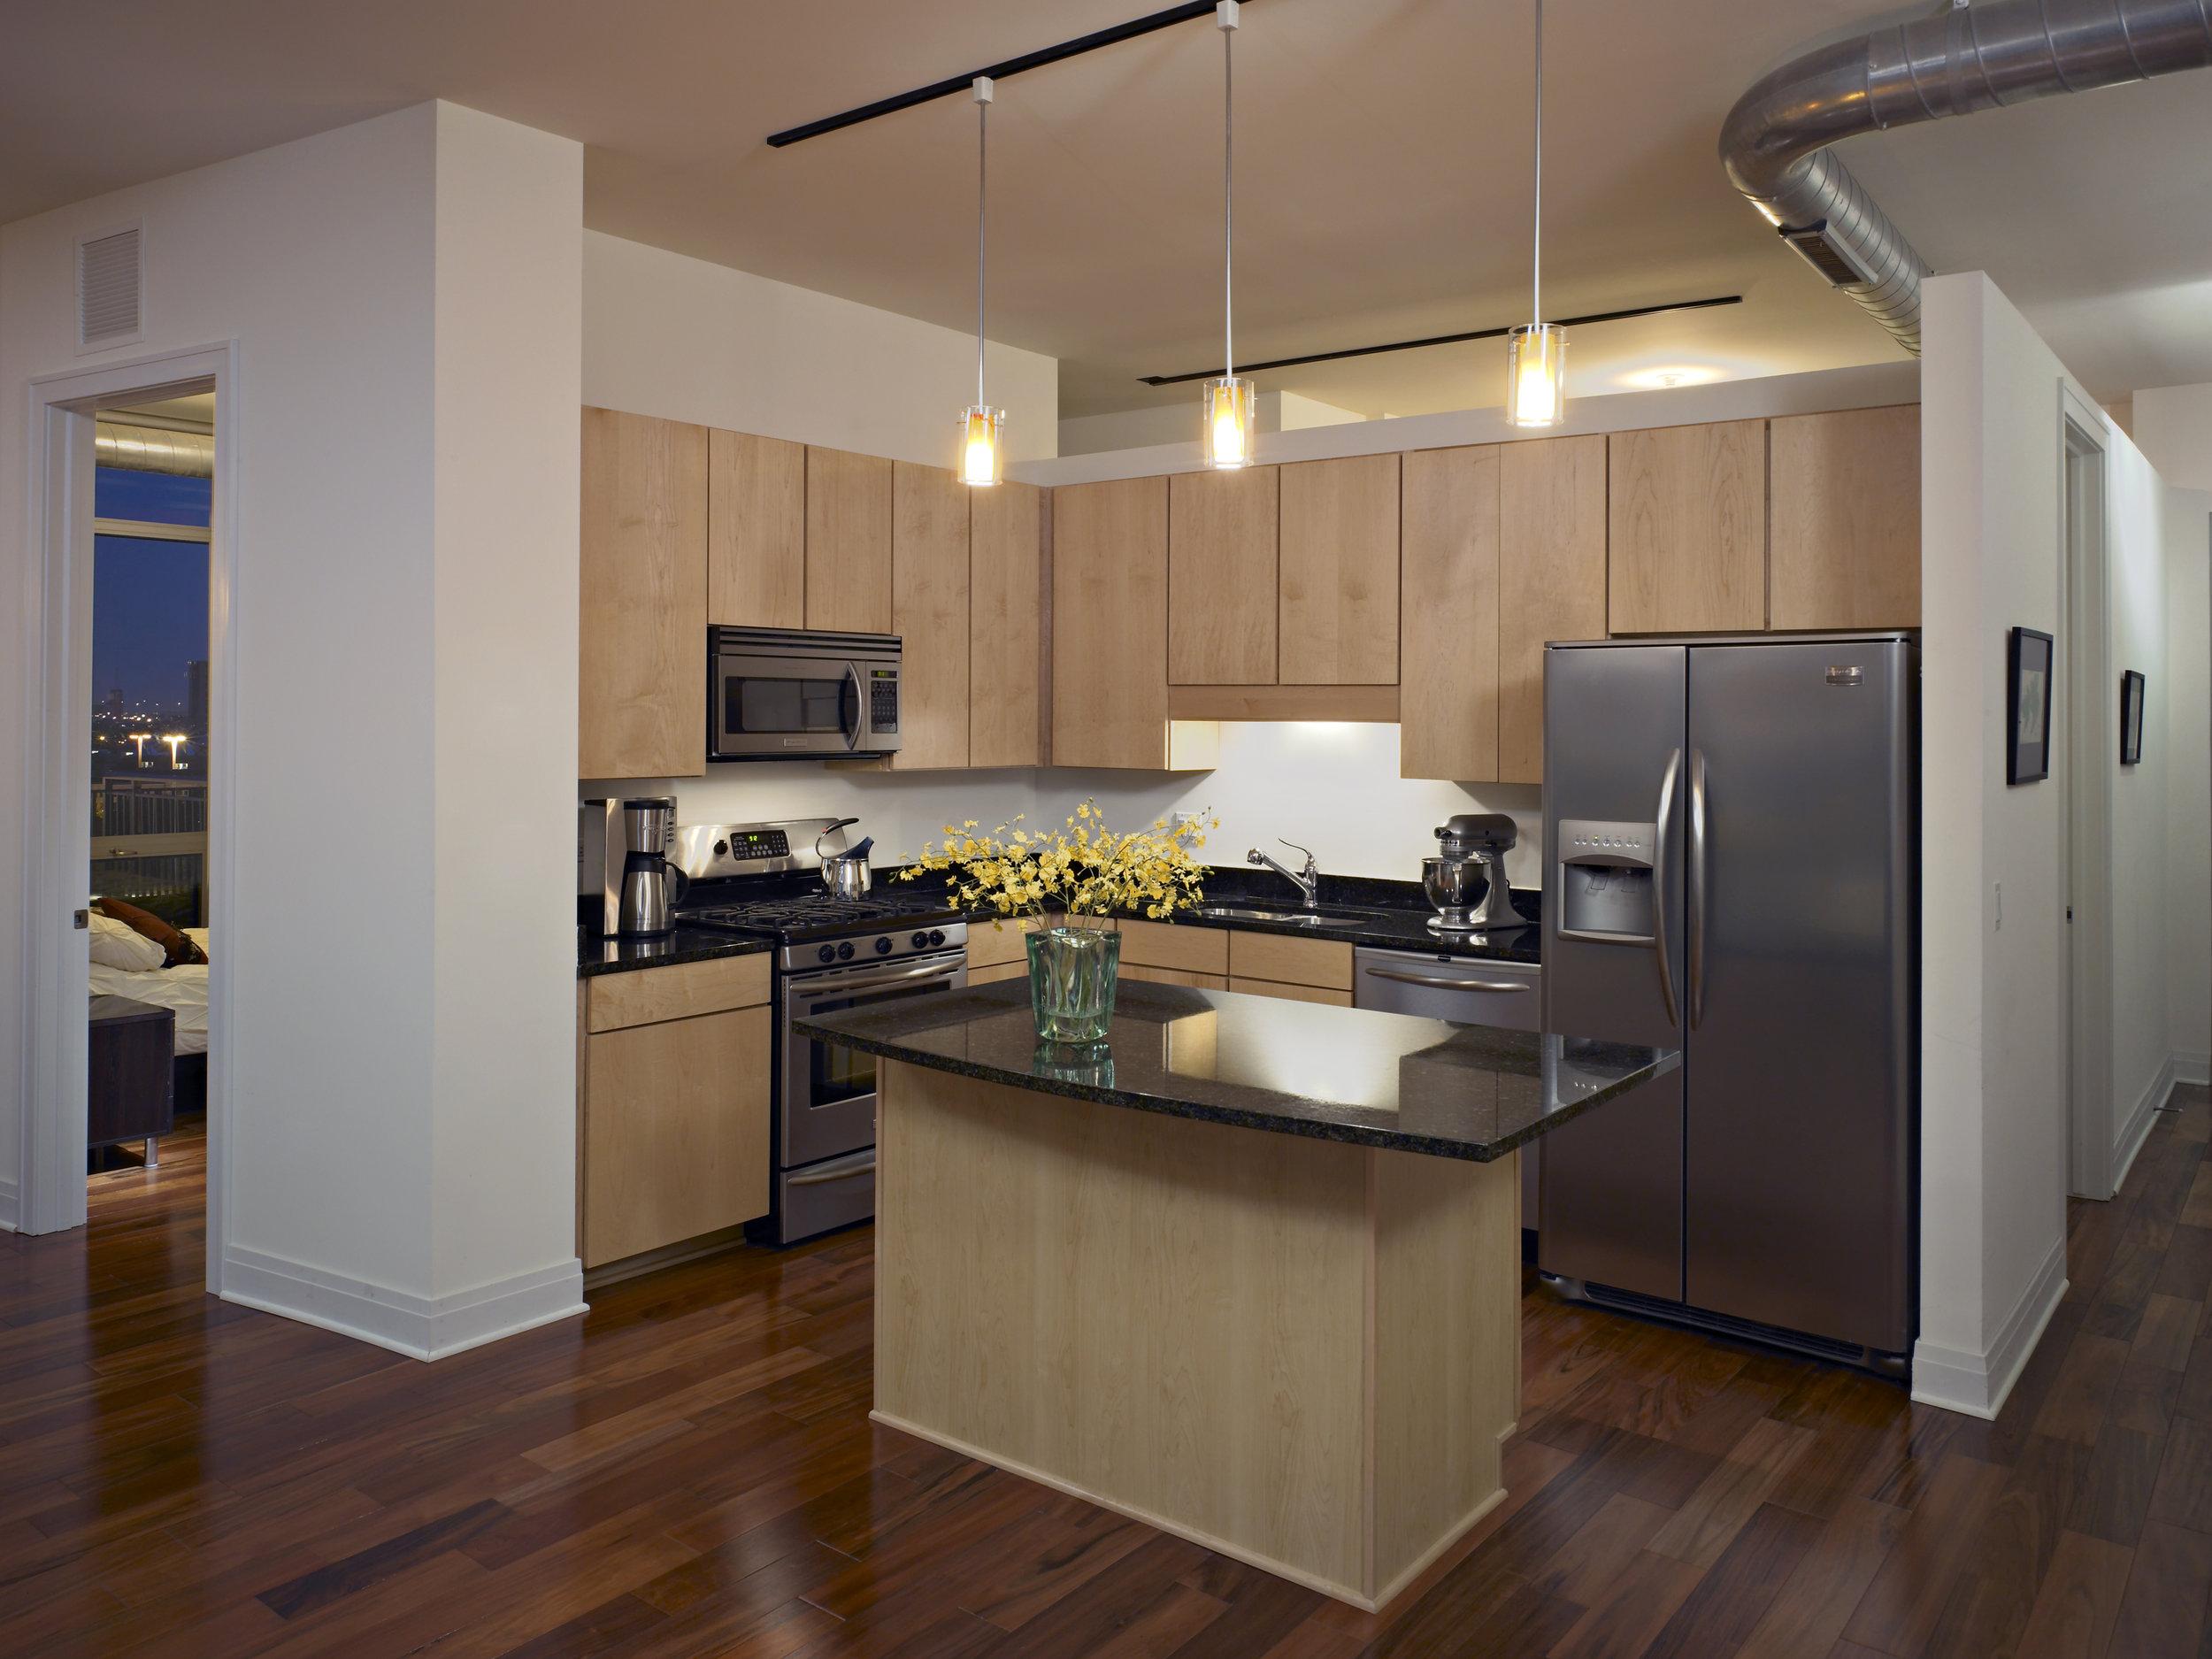 Odyssey 701 kitchen.jpg